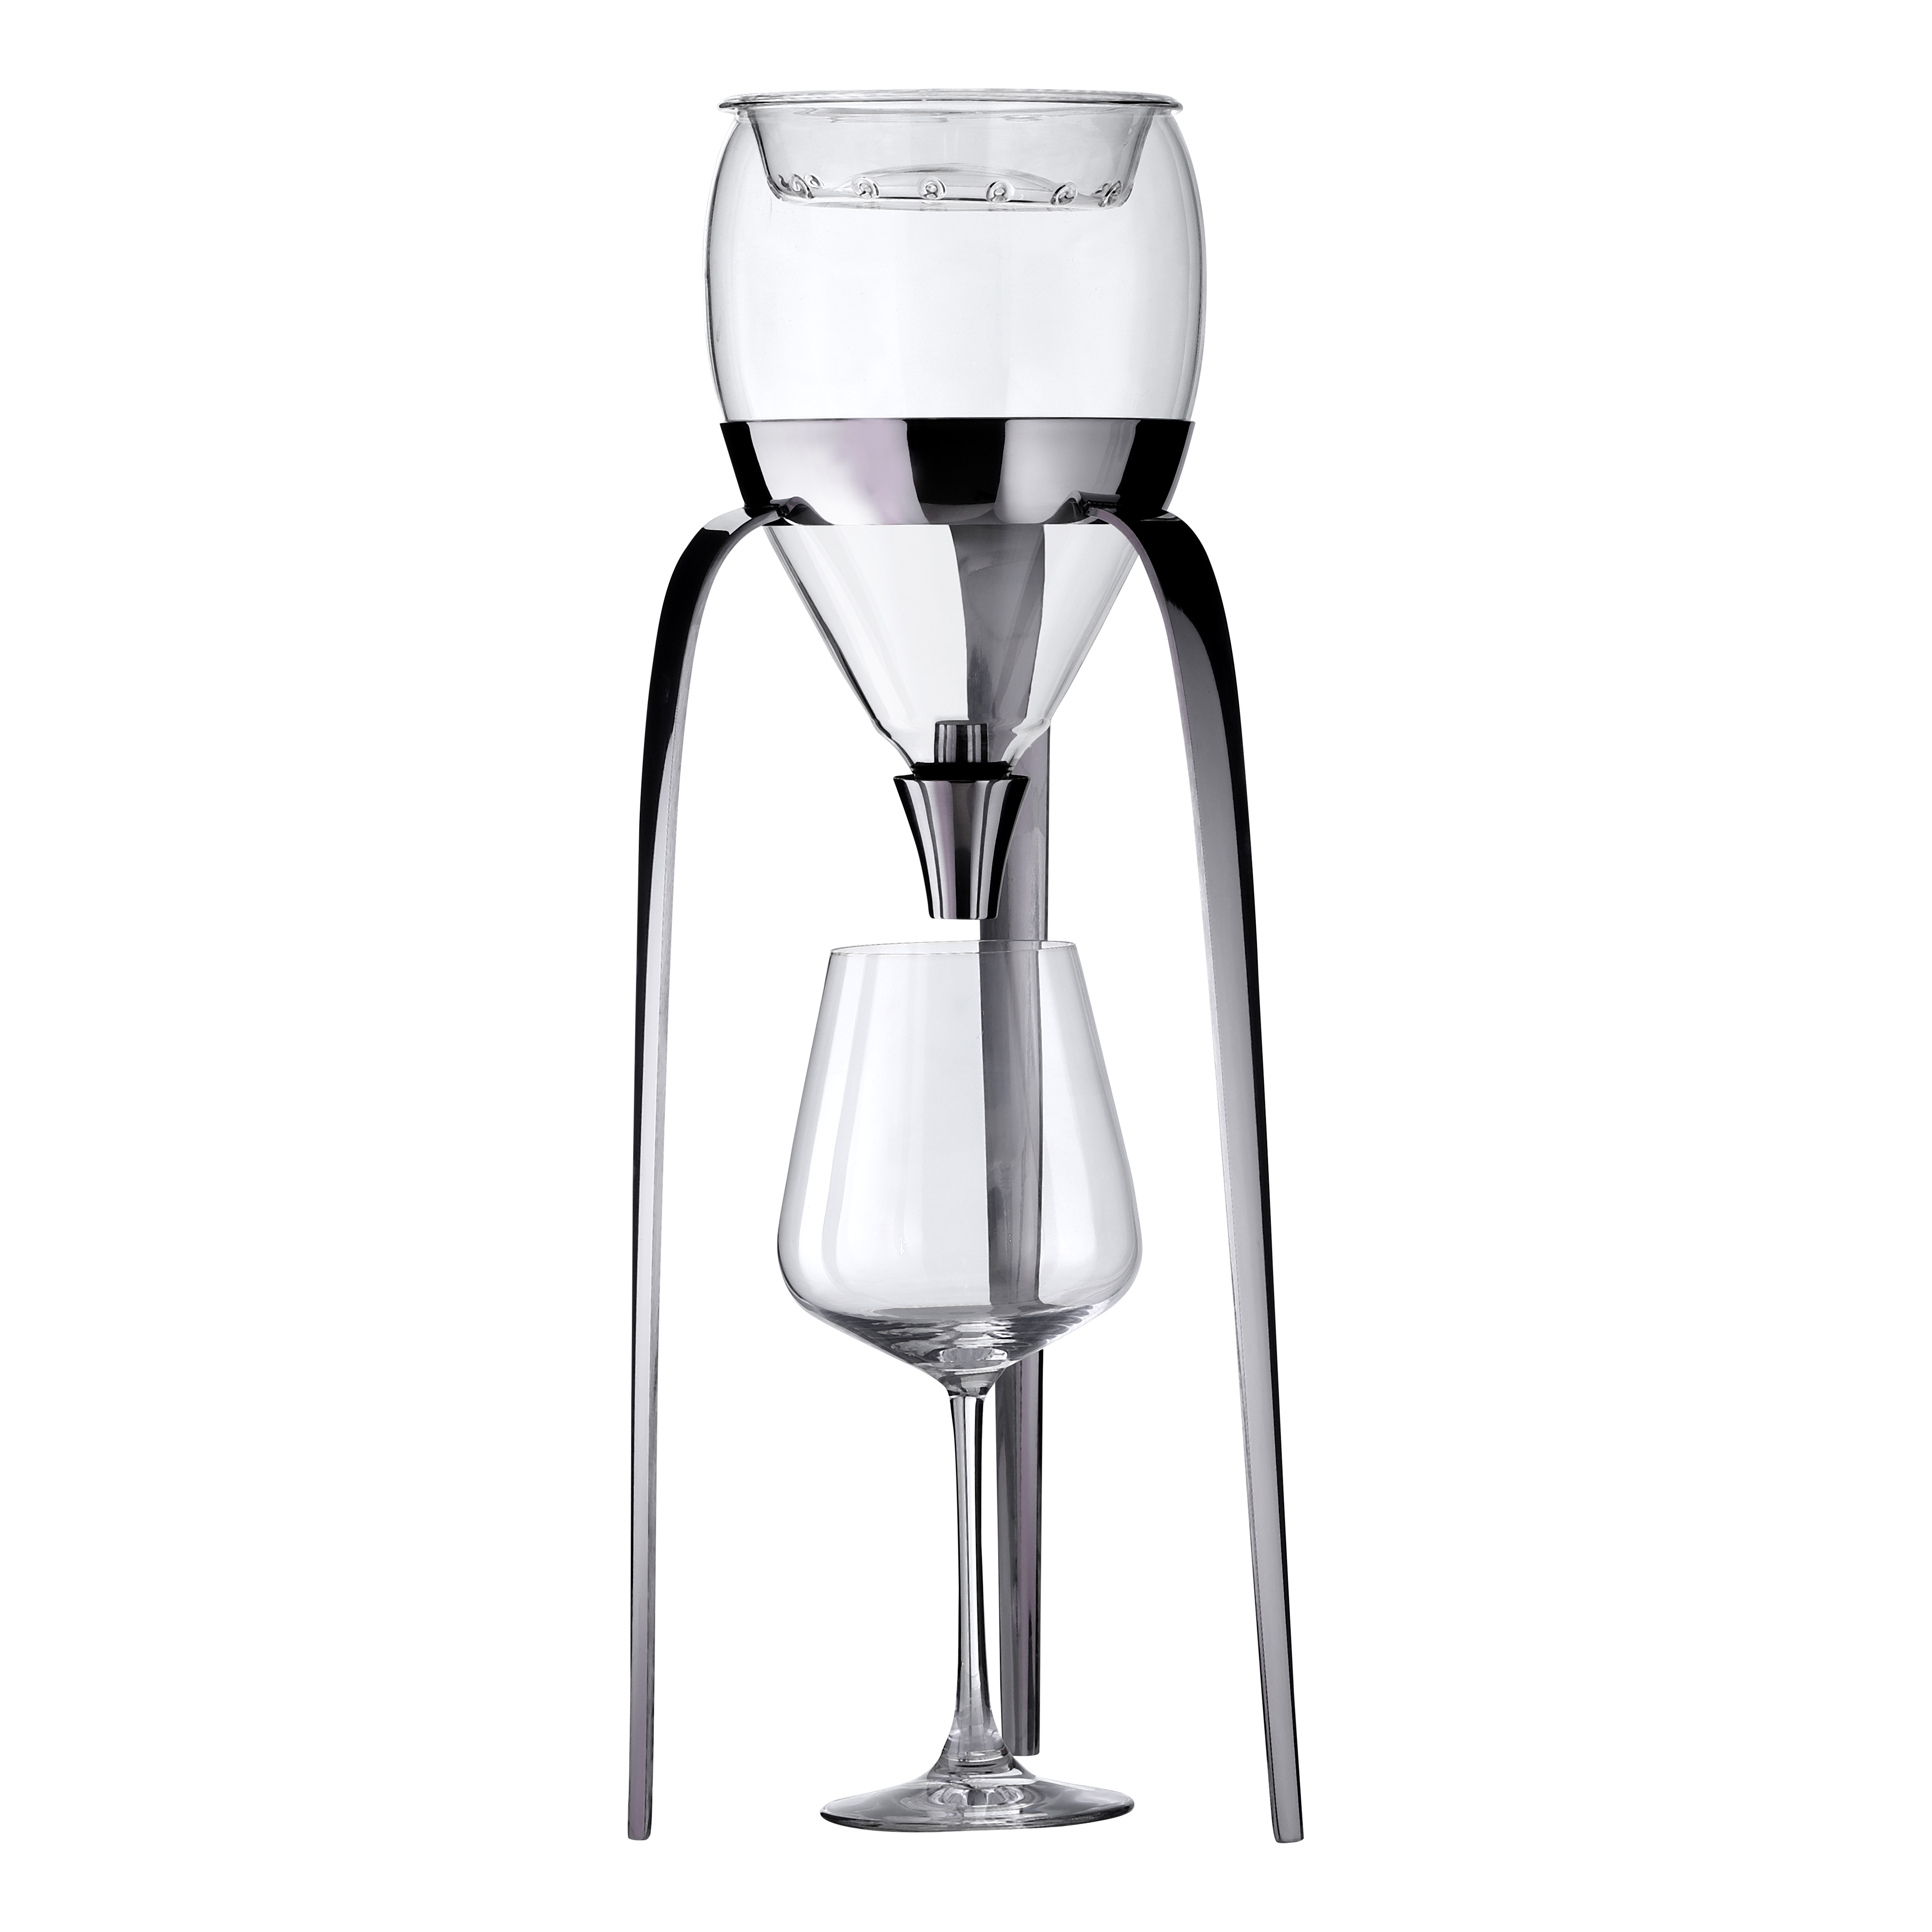 VORTEX Somm Aerating Wine Dispenser